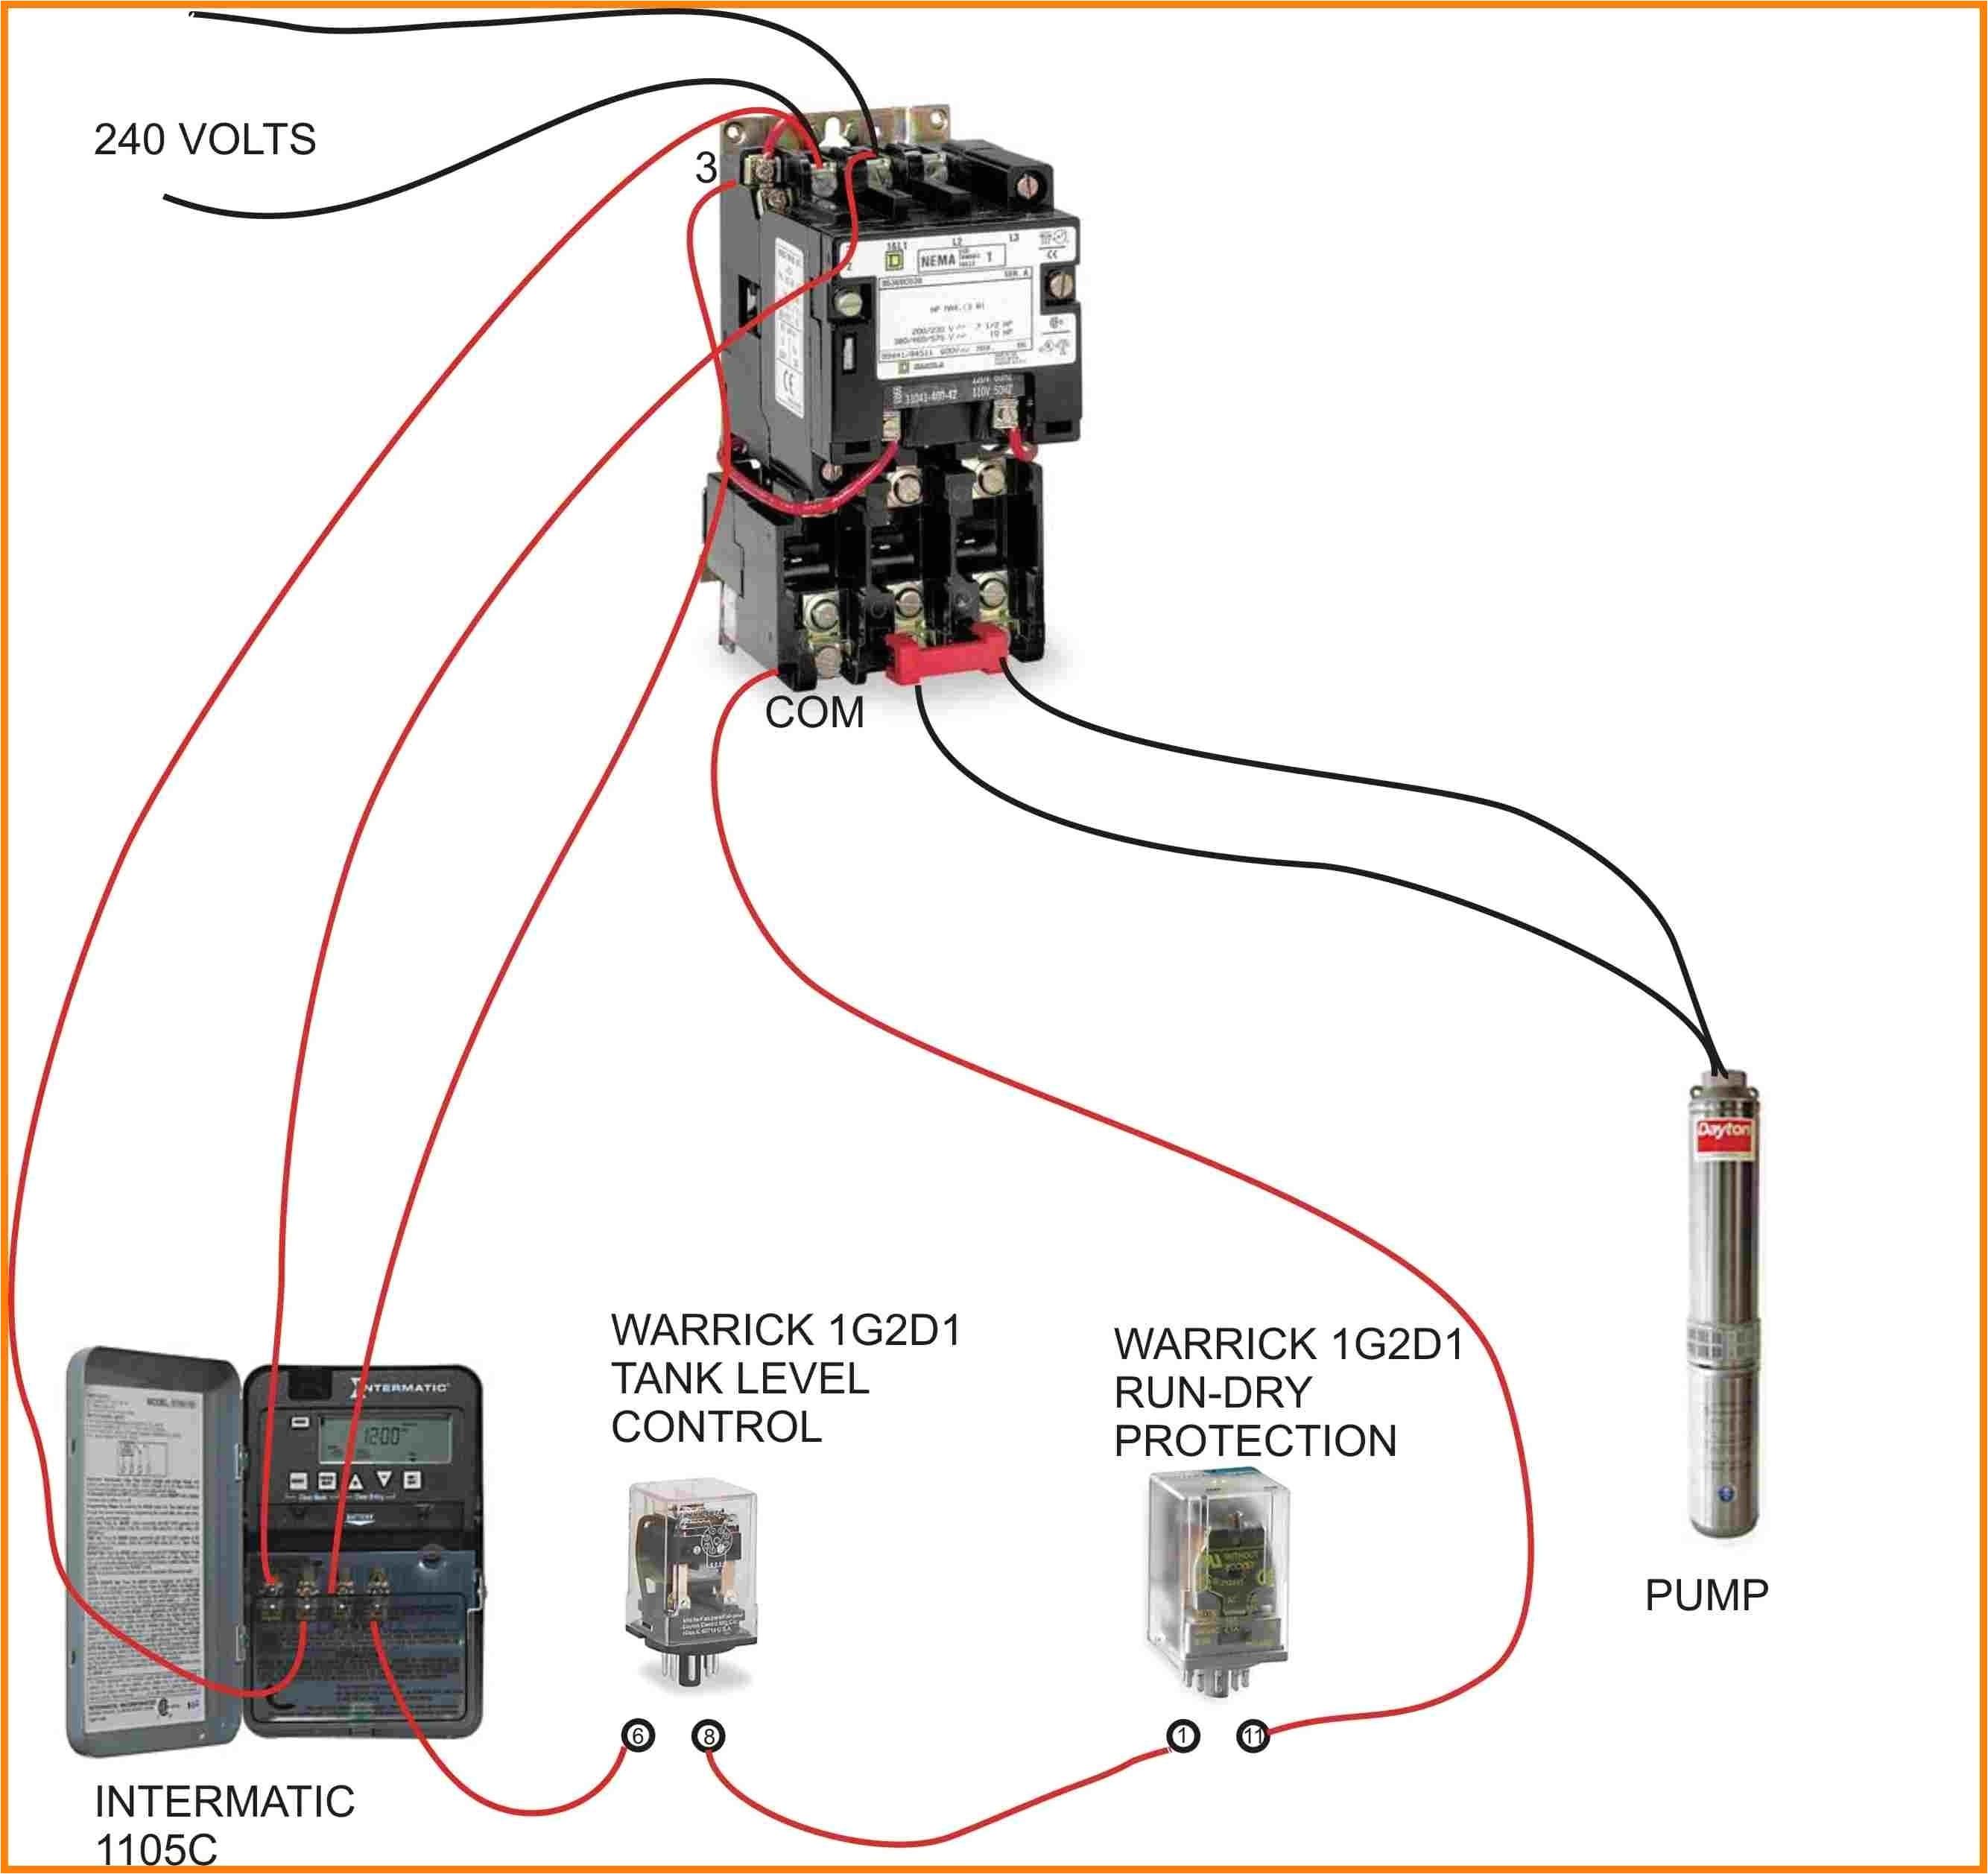 240 3 phase contactor wiring wiring diagram blog 240 volt contactor wiring diagram